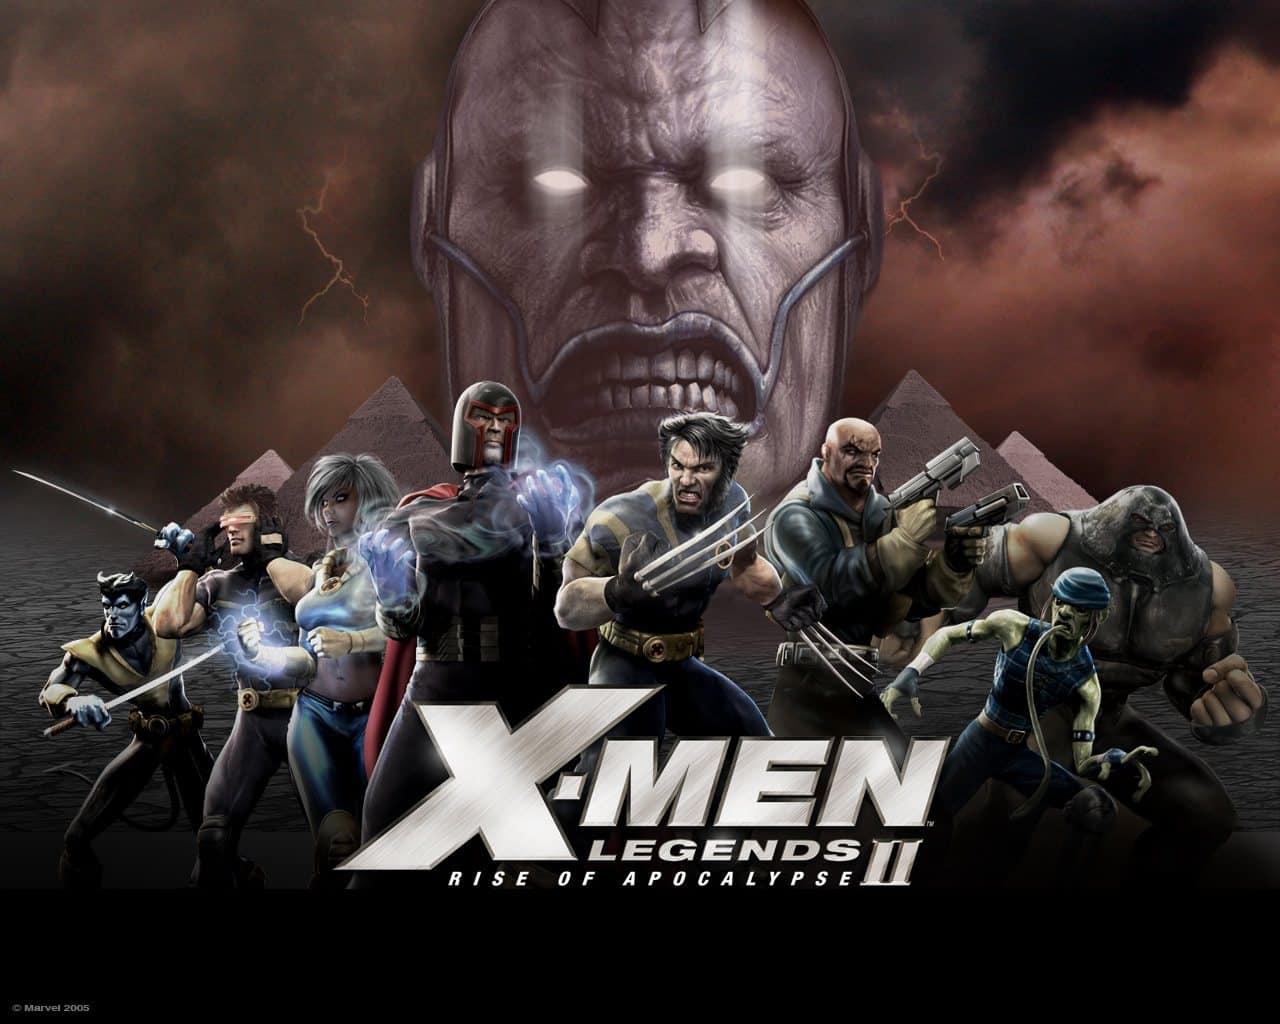 X-Men-Legends-II-Rise-of-the-Apocalypse